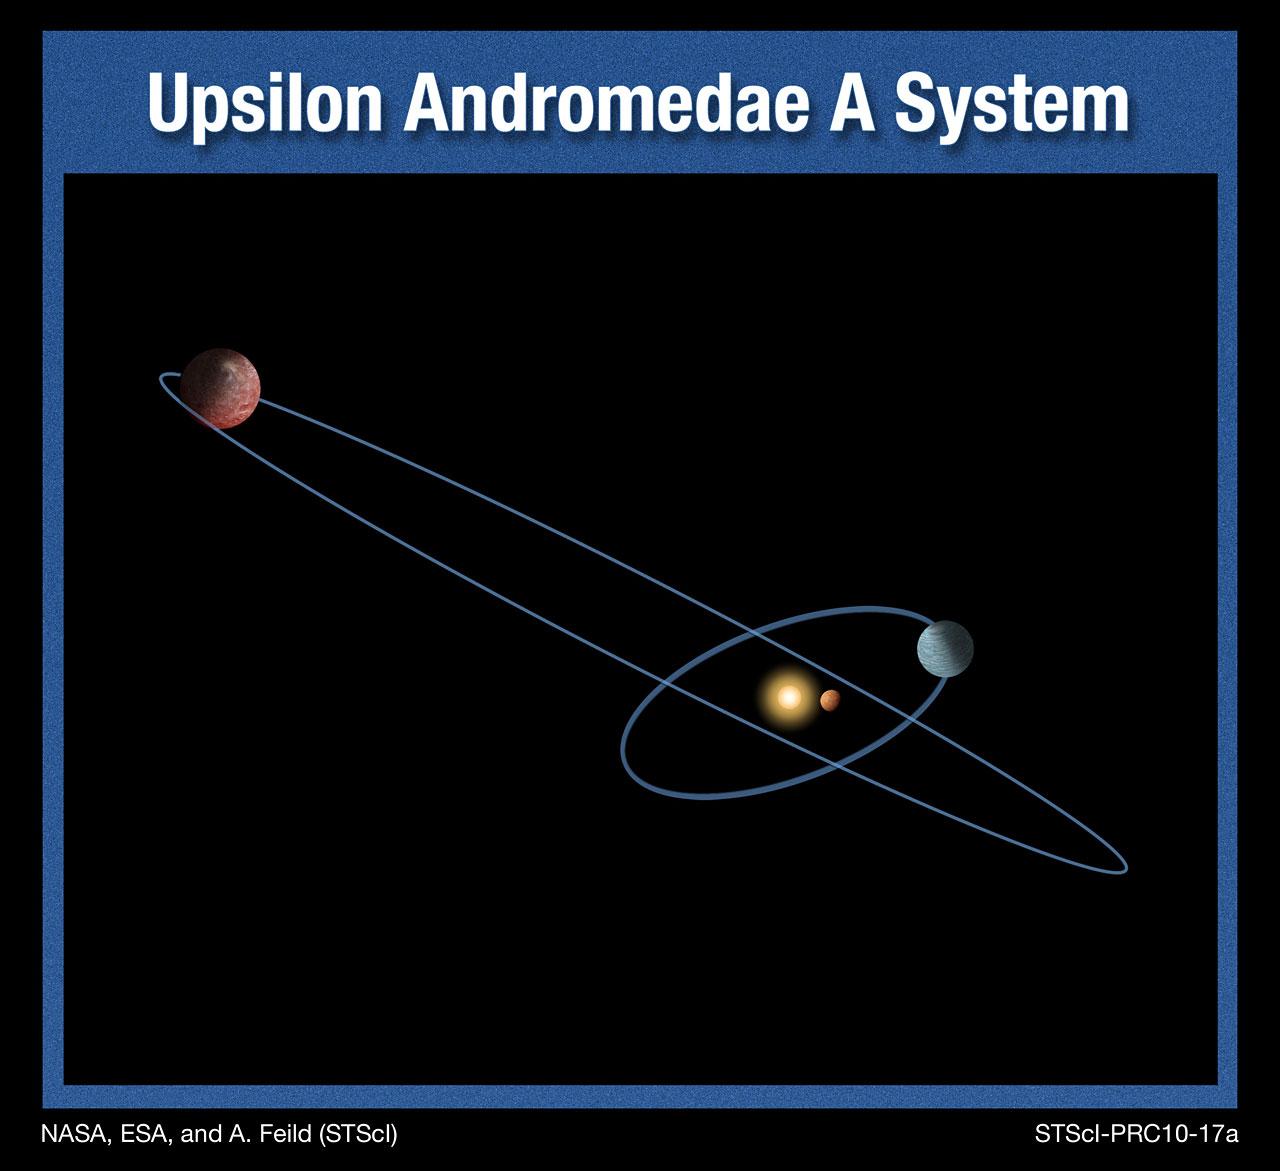 Upsilon Andromedae A system (artist's impression)